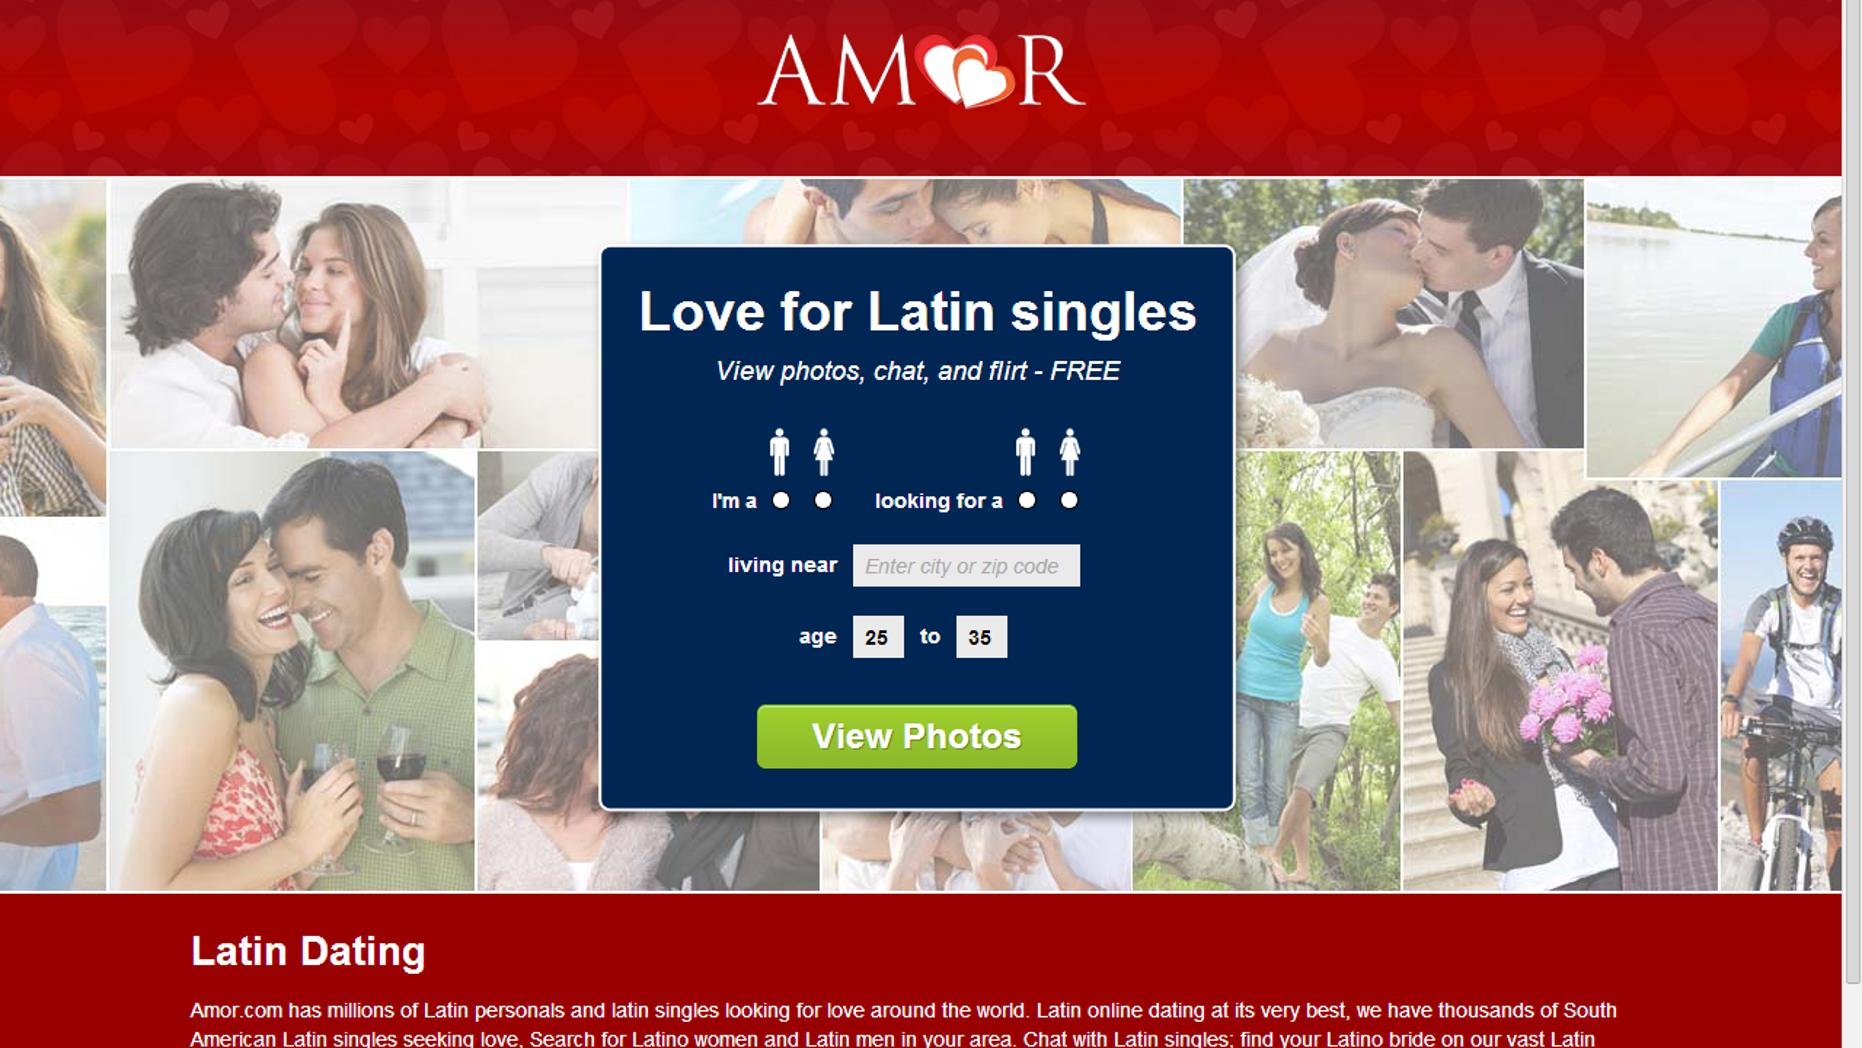 Ethnic dating sites